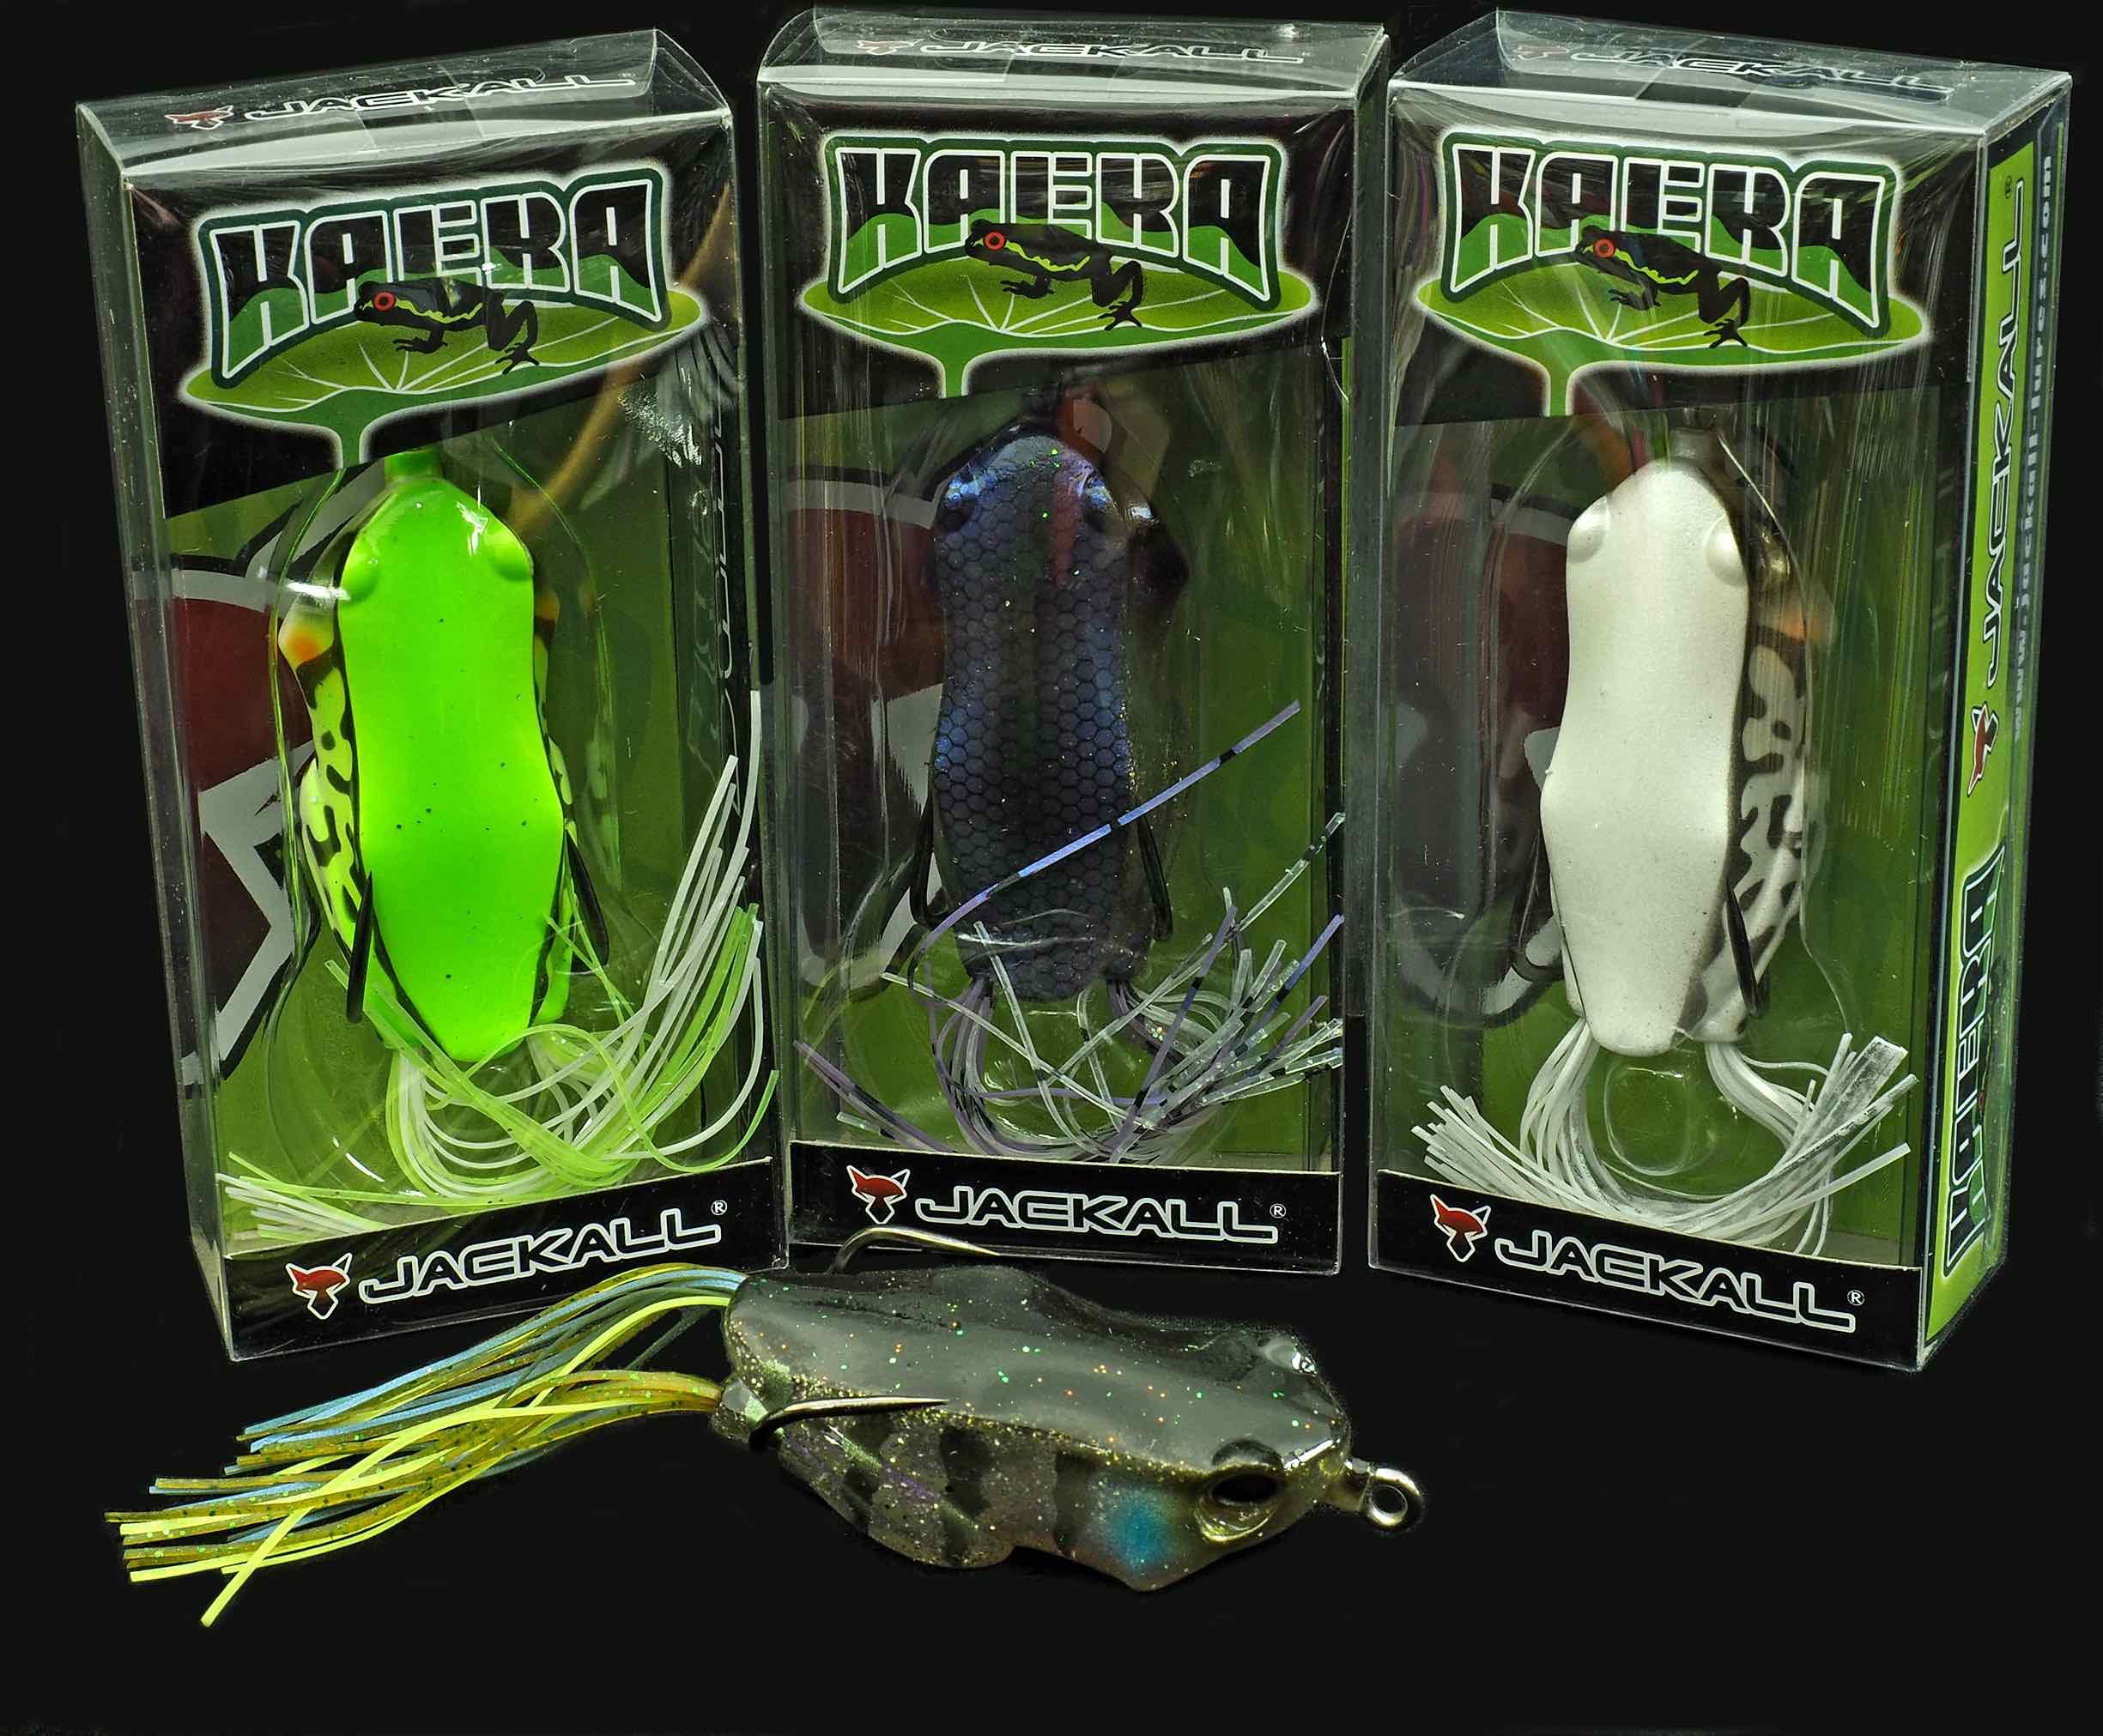 Jackall Kaera Weedless Frog